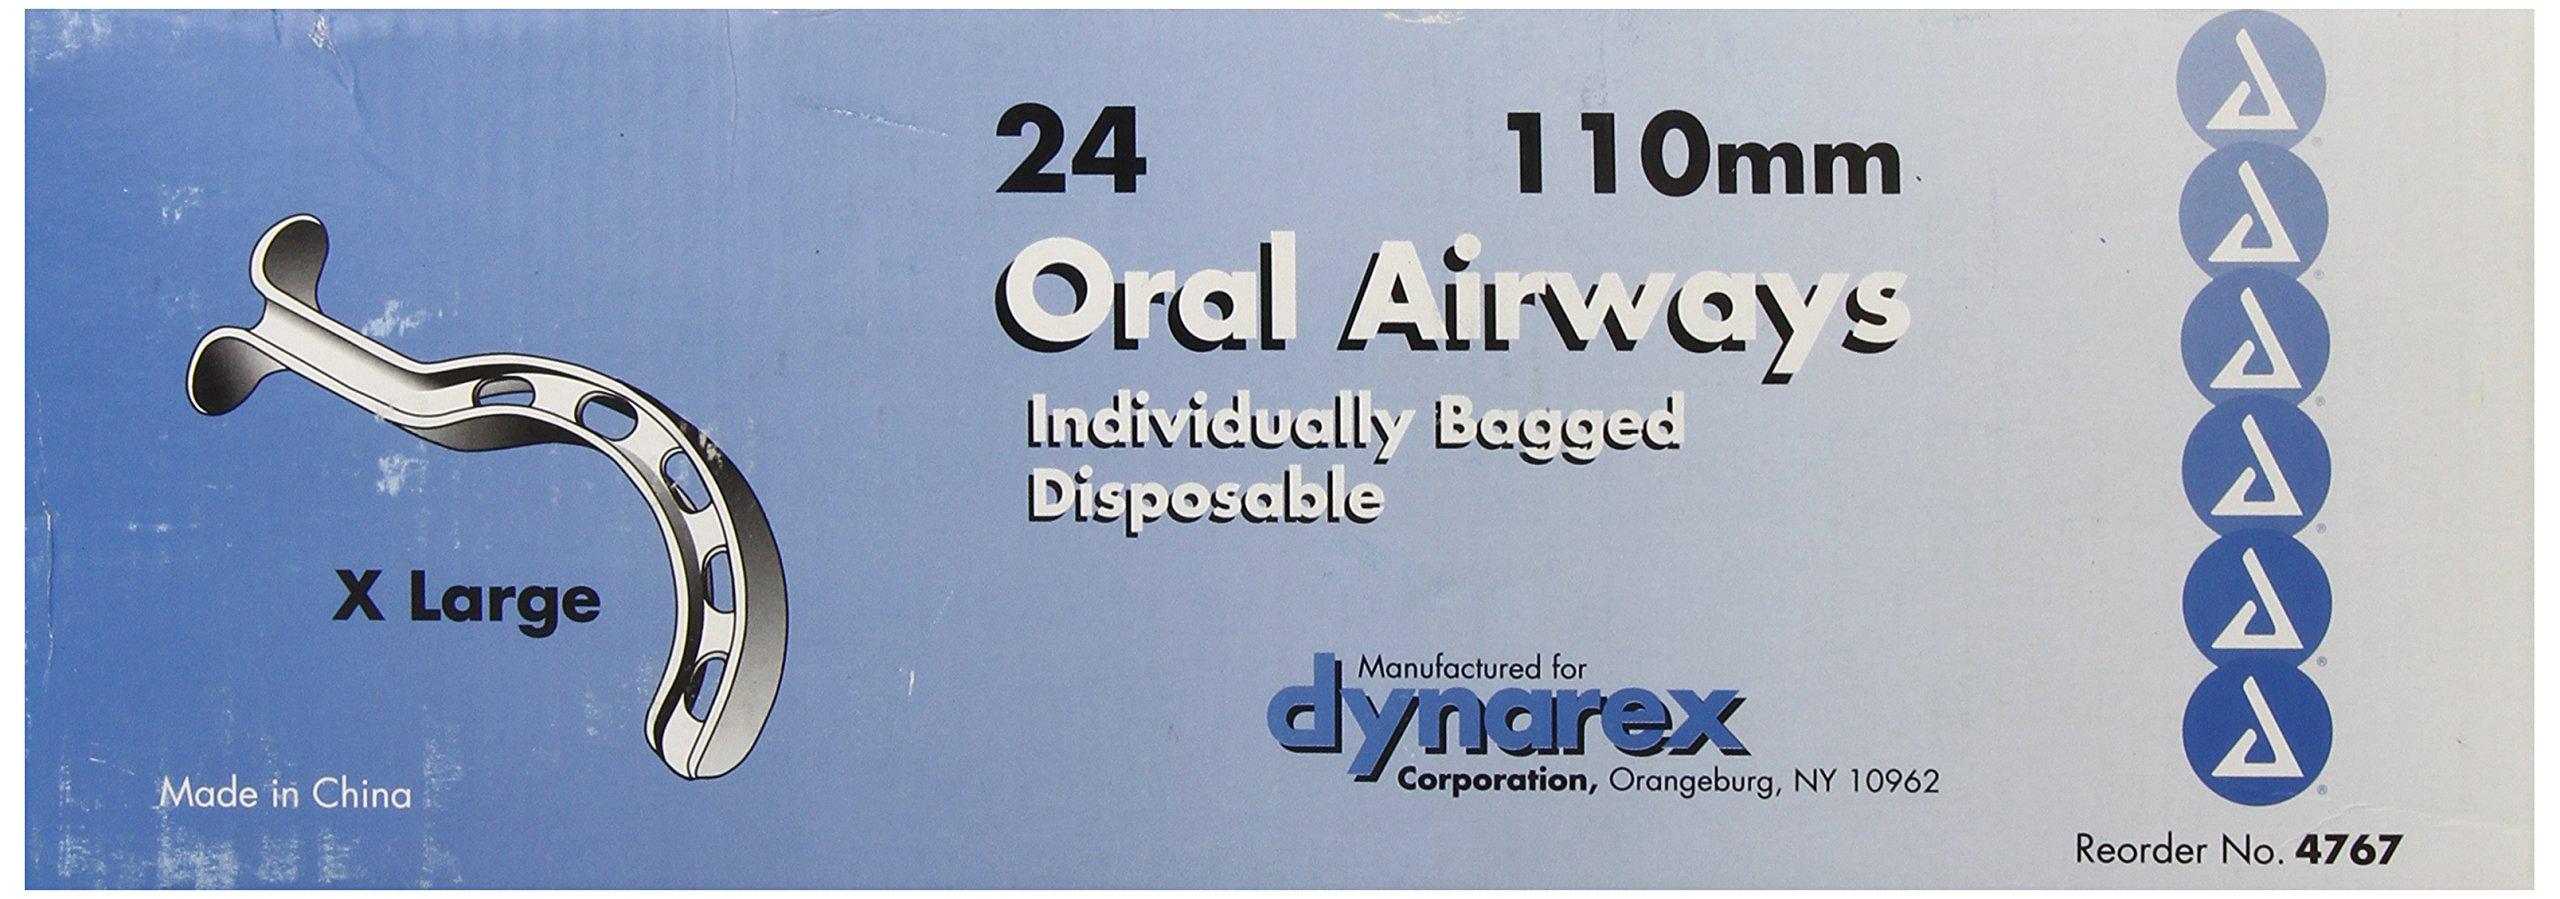 Dynarex Oral Airways (Berman Type) 110mm, X Large Orange 24-Bg/Bx by Dynarex